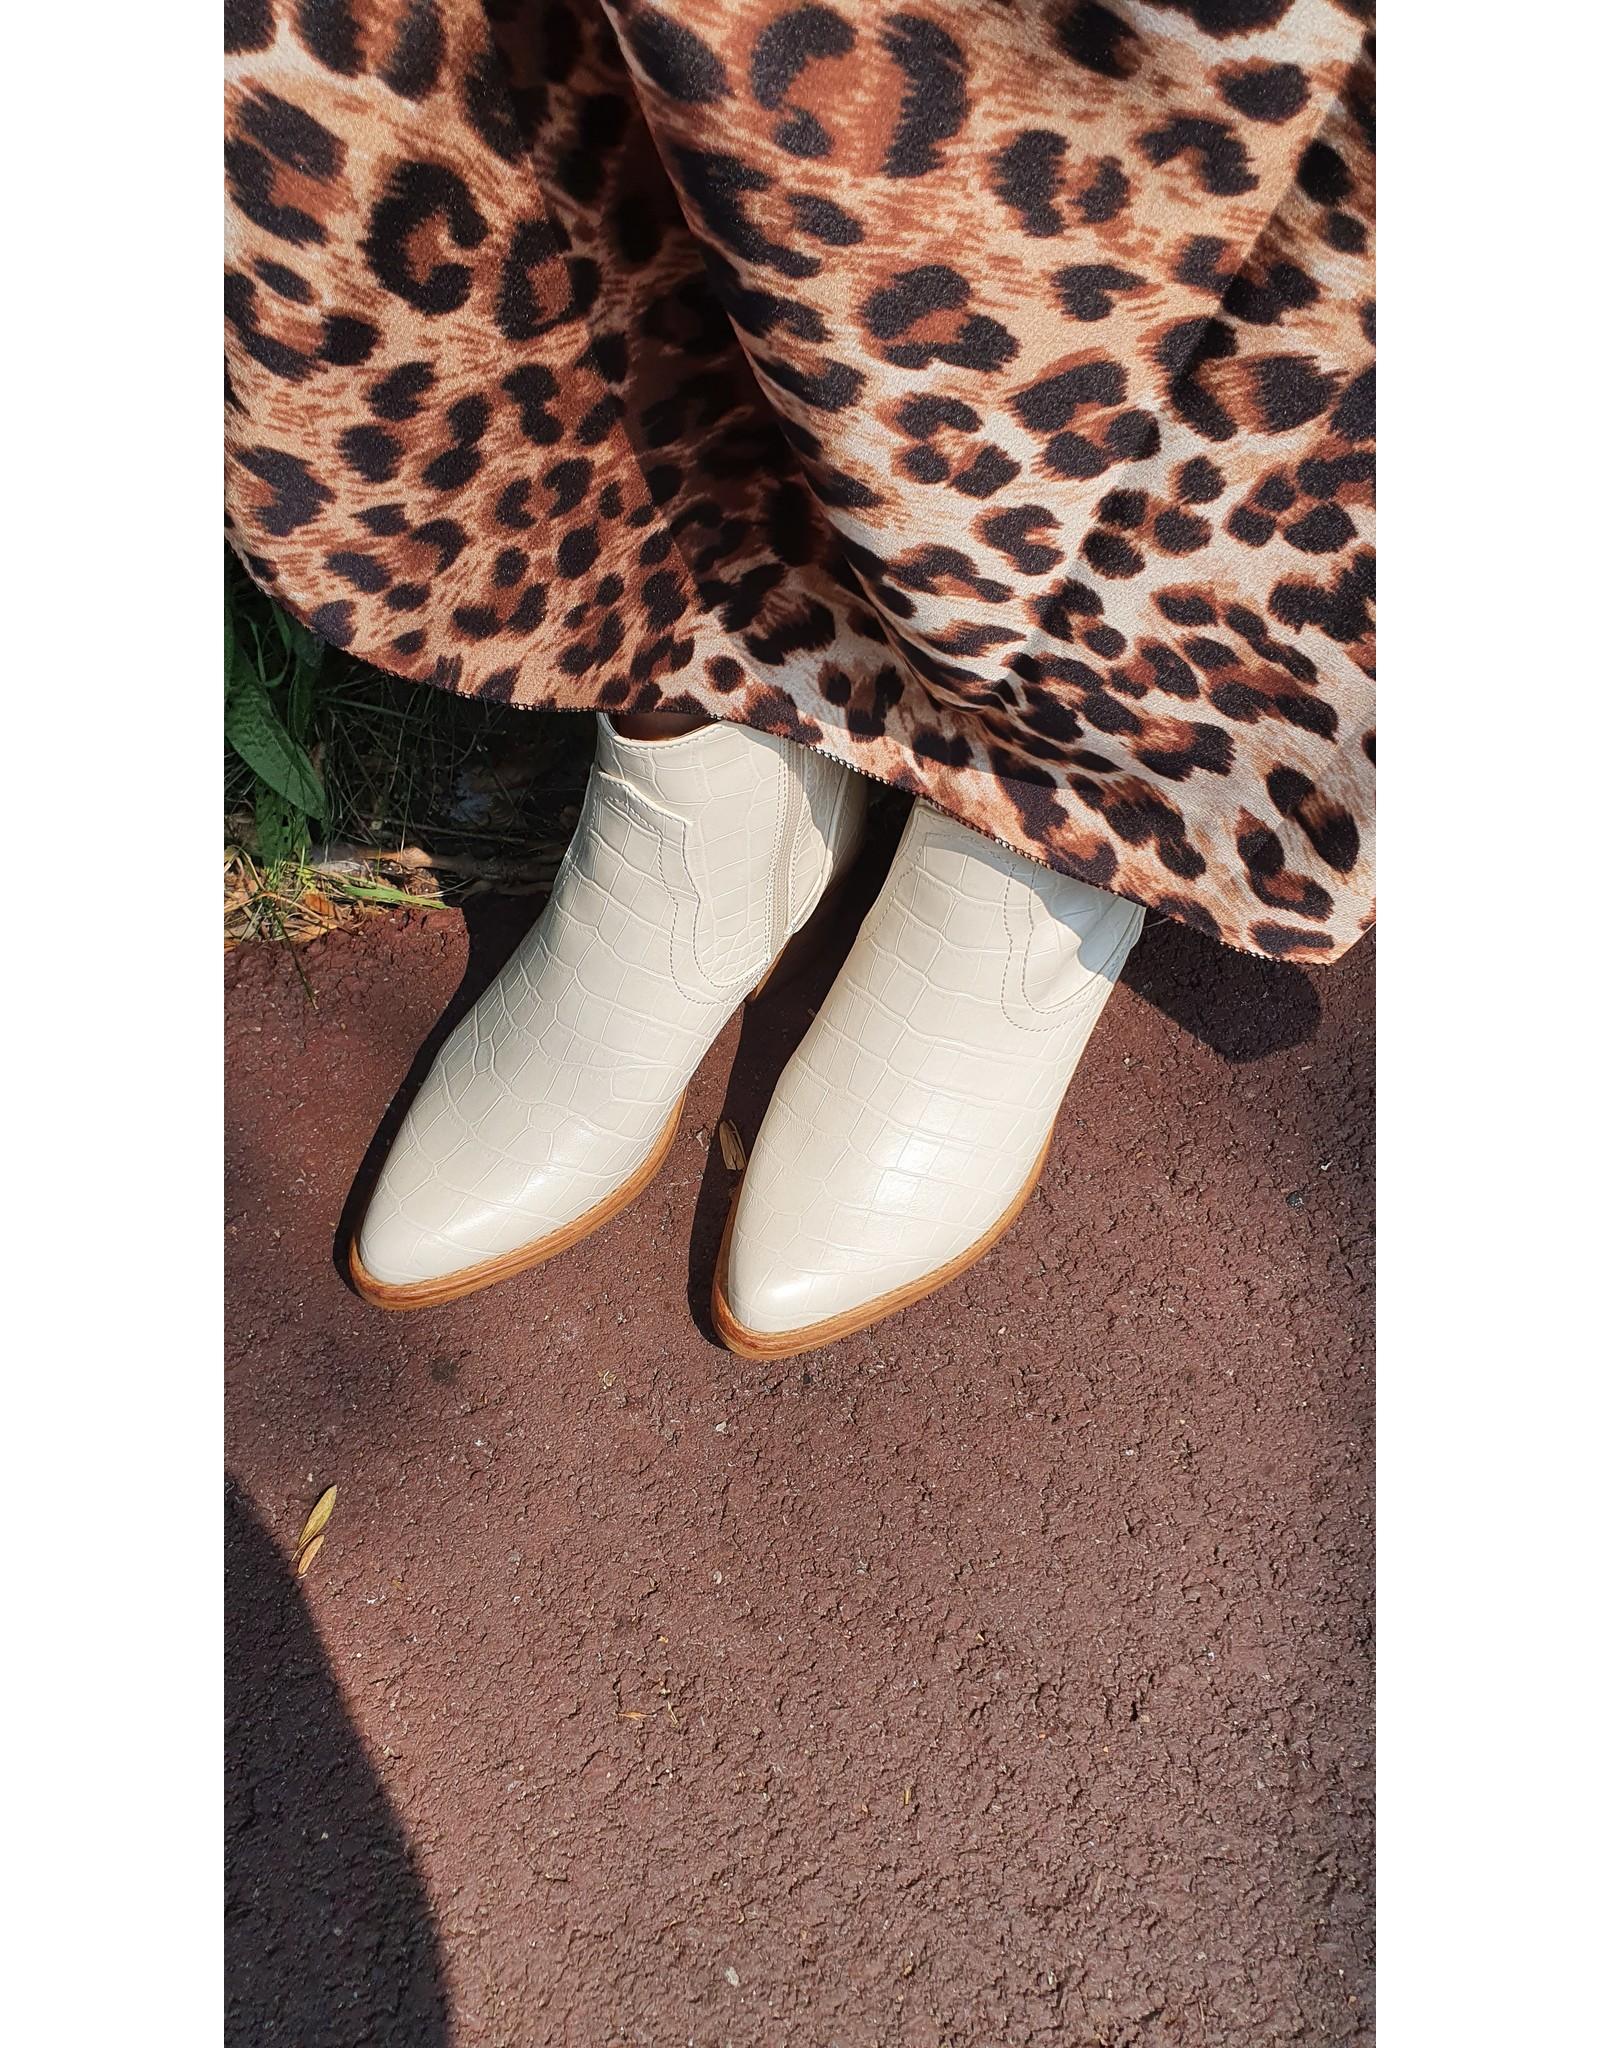 Croco boots beige